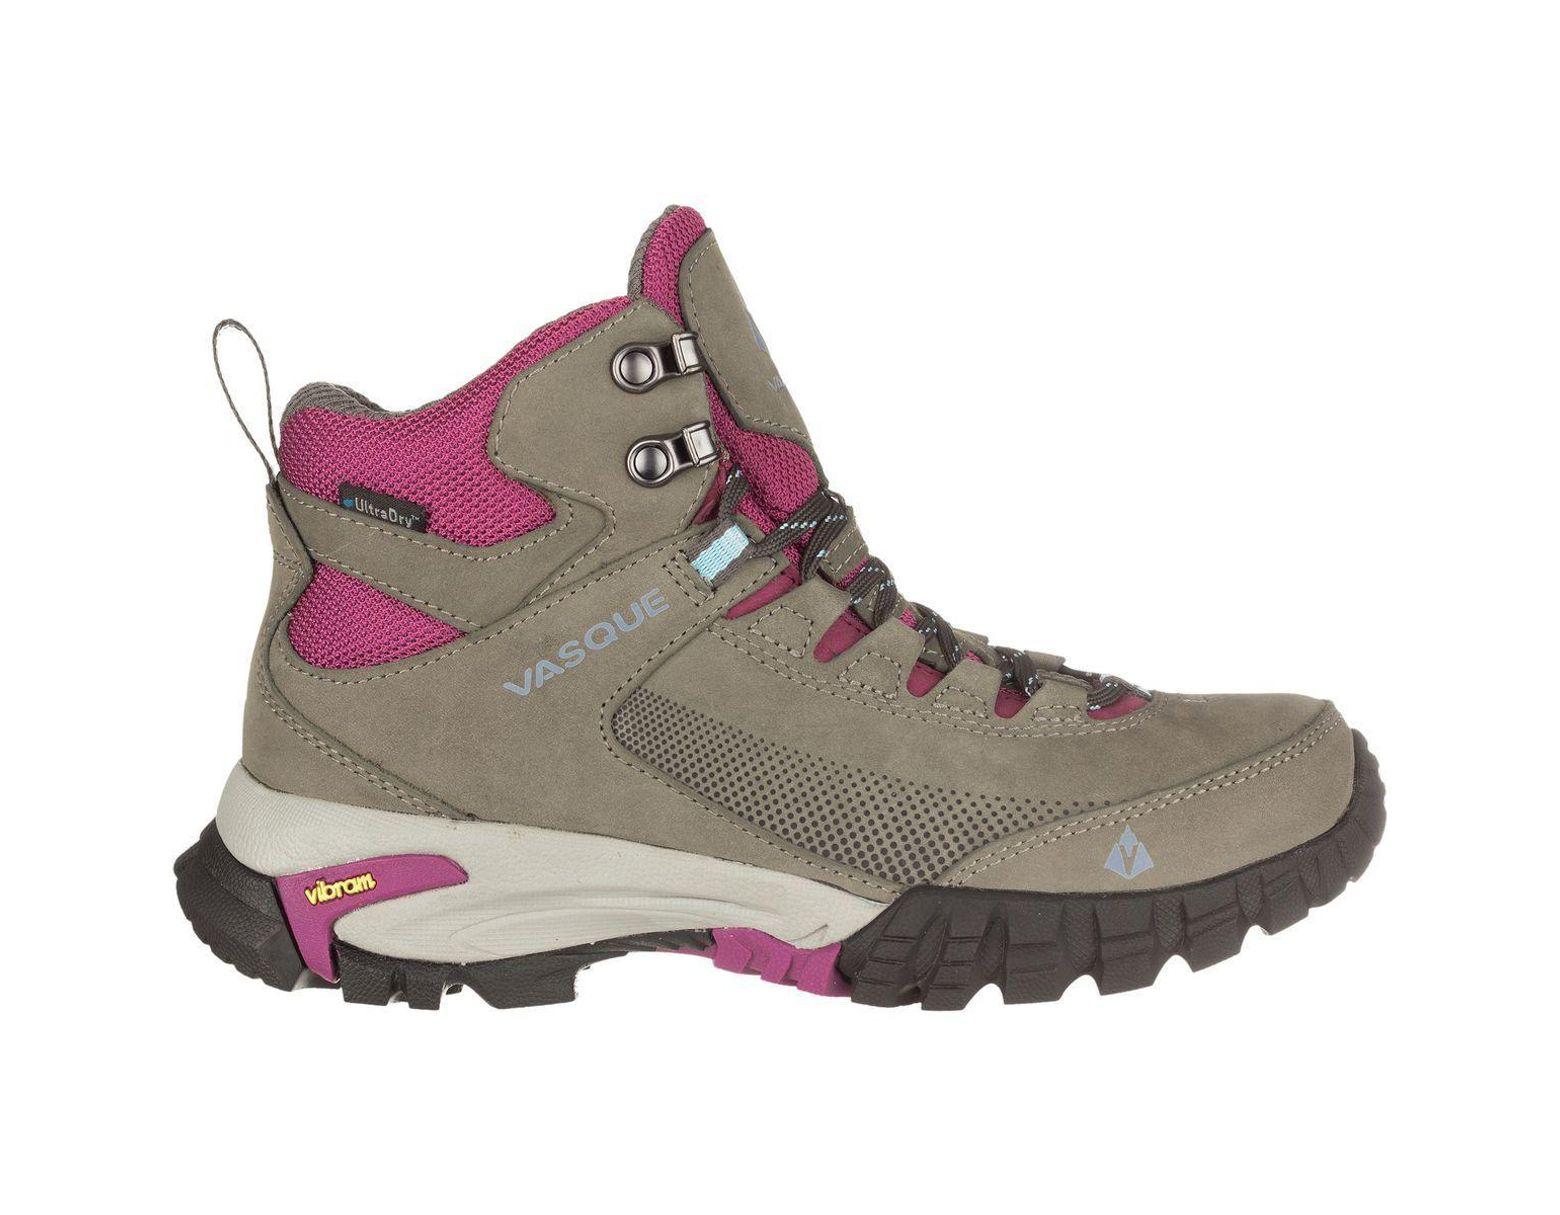 0844652aeca Women's Talus Trek Ultradry Hiking Boot